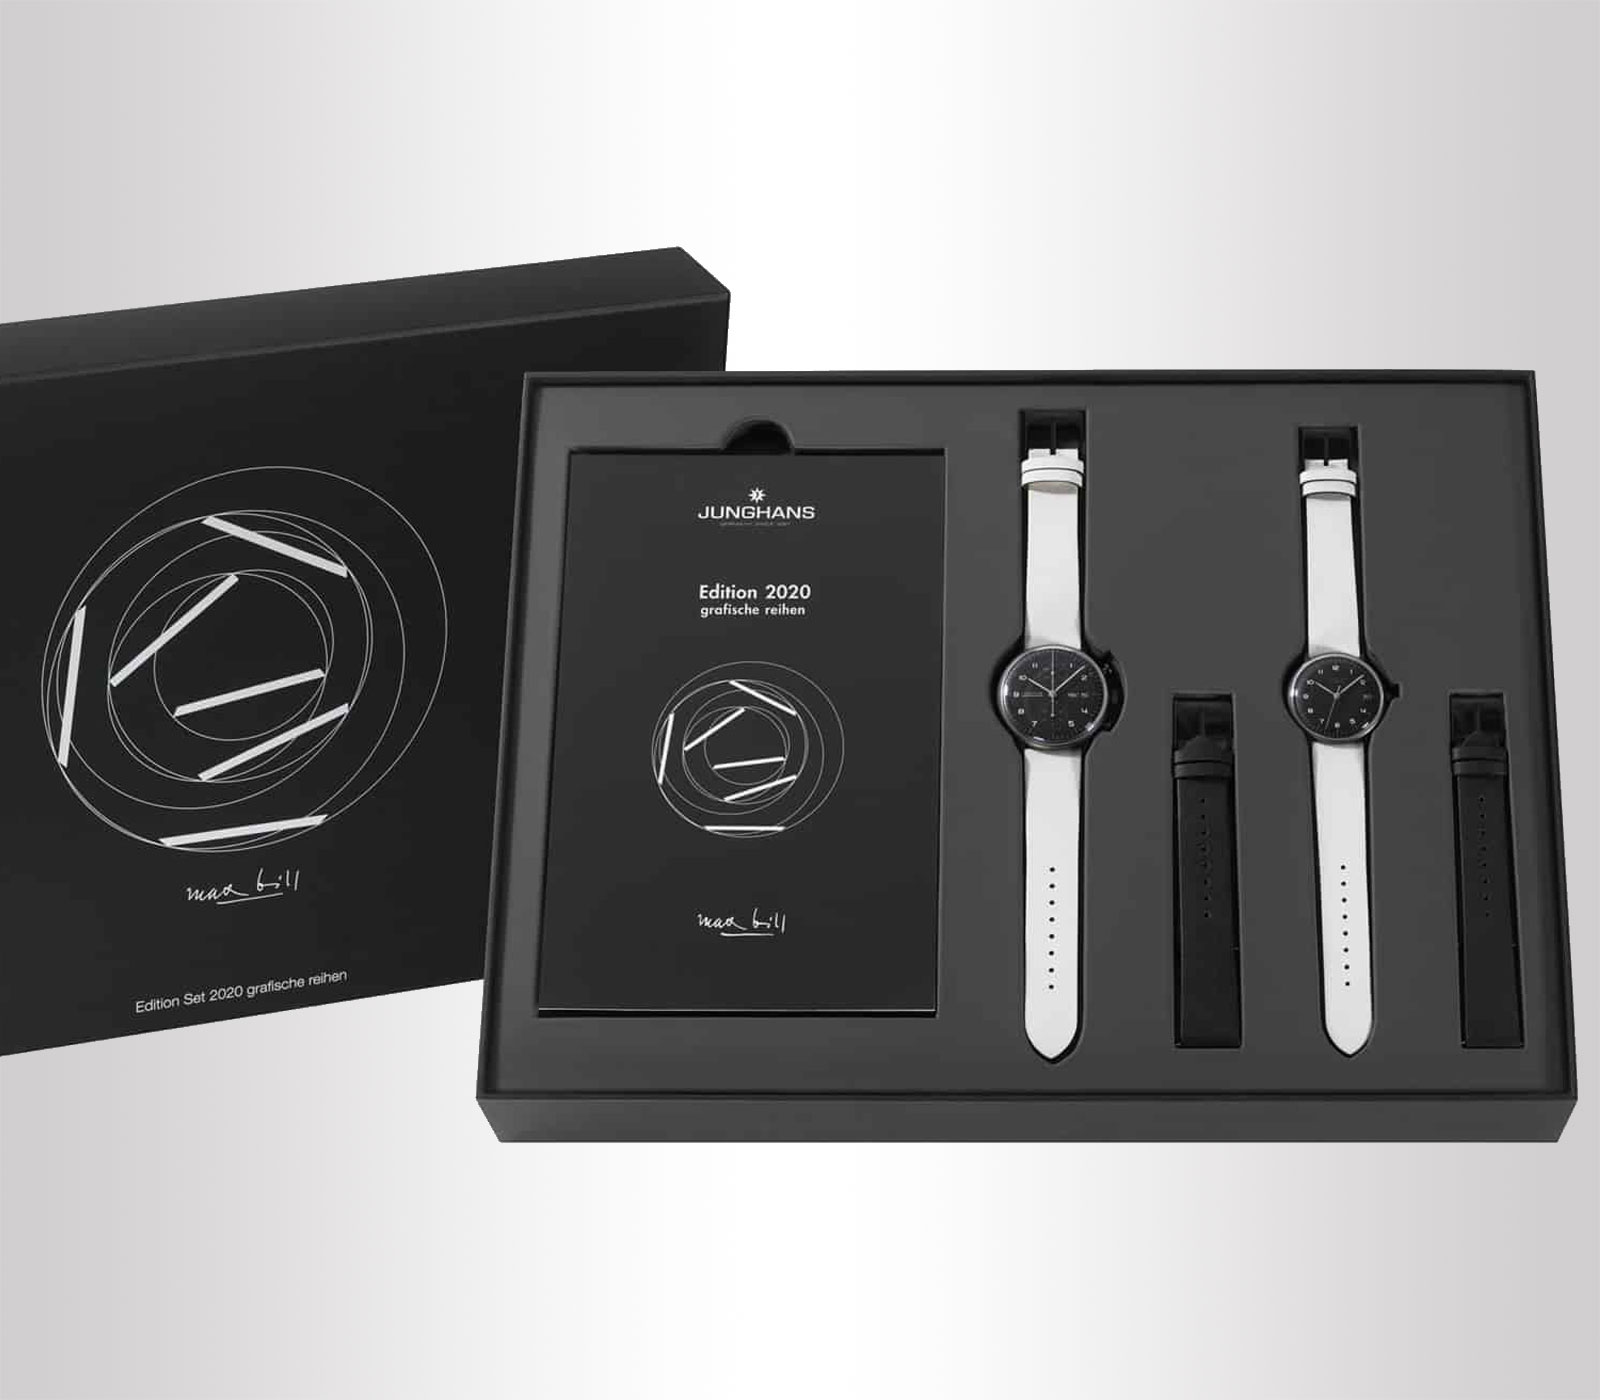 Set orologi Junghans max bill Edition Set 2020 limited edition solo 222 esemplari